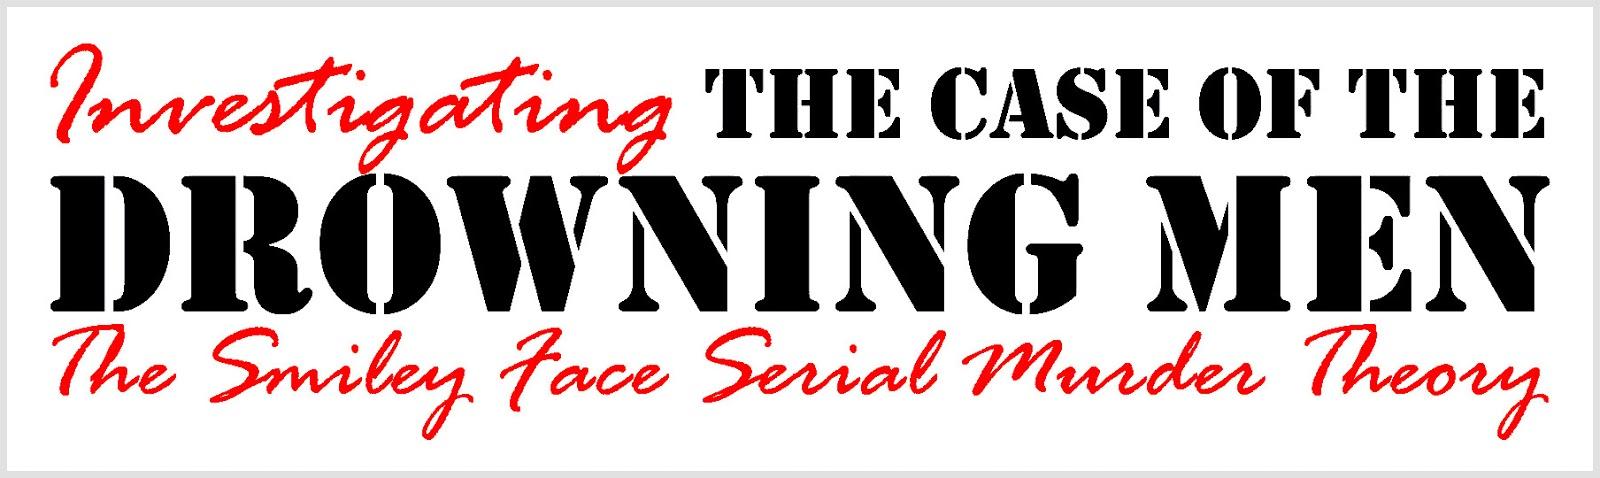 http://www.amazon.com/CASE-DROWNING-MEN-Investigating-Smiley-ebook/dp/B0089HD4A4/ref=asap_B004SXLULI_1_1?s=books&ie=UTF8&qid=1417530072&sr=1-1